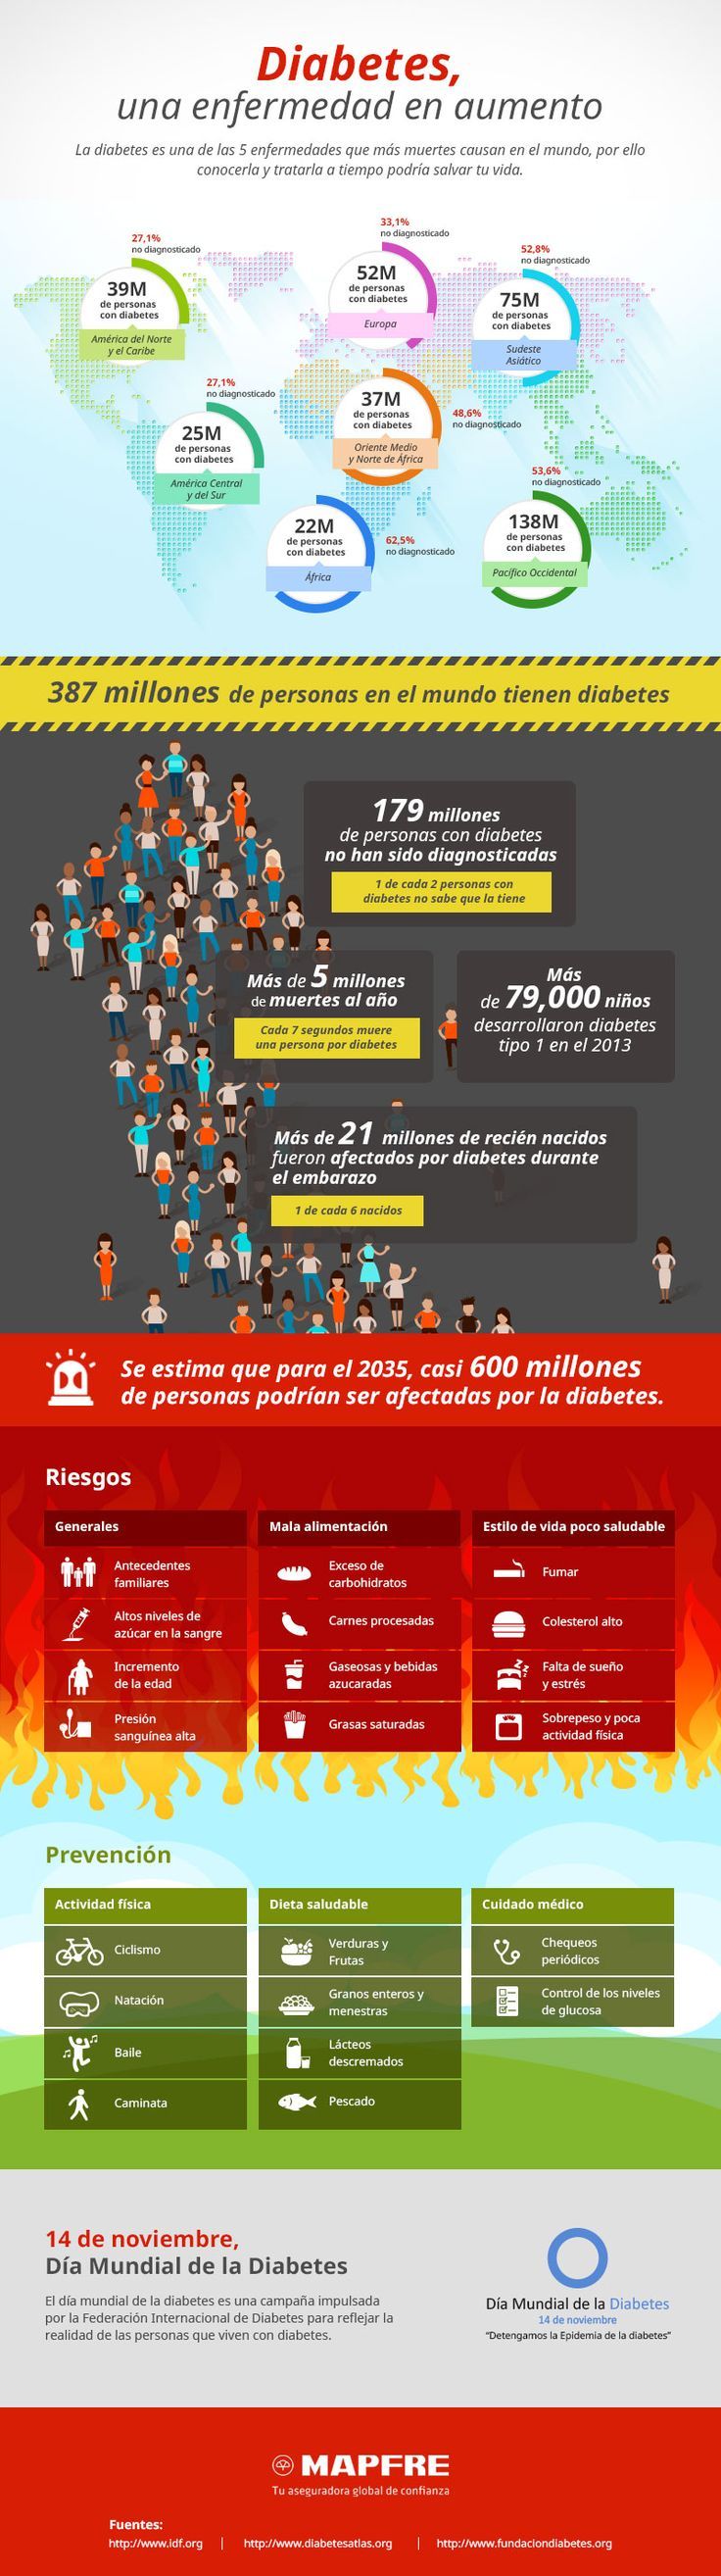 Diabetes, una enfermedad que causa mas de 5 millones de muertes al año. Infografia  http://clubvive100.com/diabetes-infografia/ Club Vive100